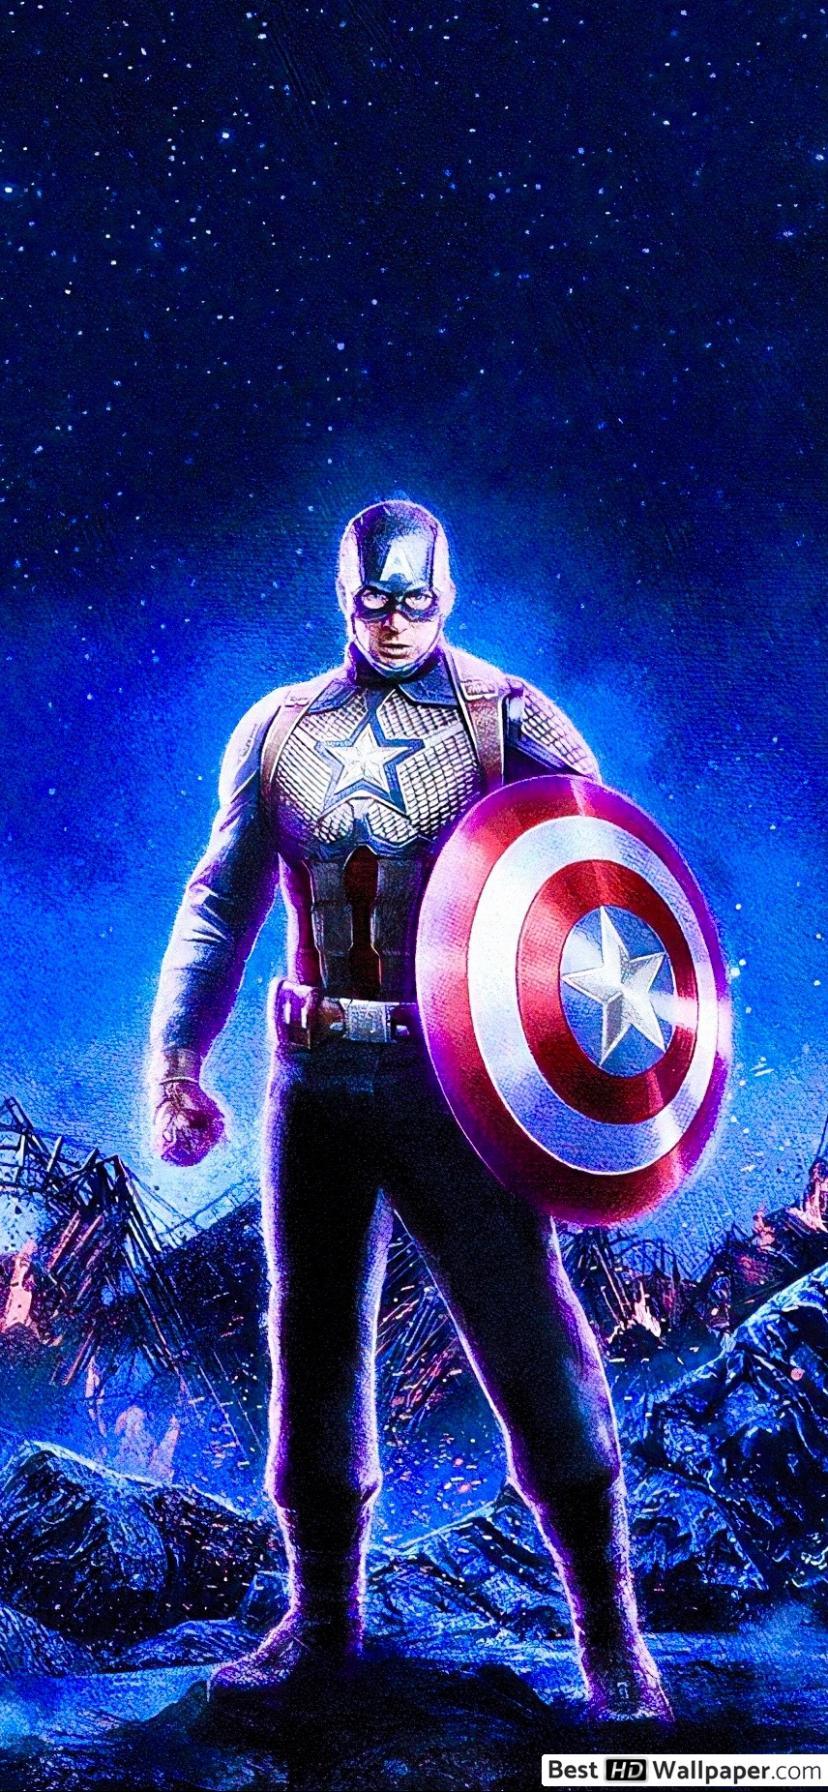 Avengers Endgame Iron Man Captain America Thor - HD Wallpaper